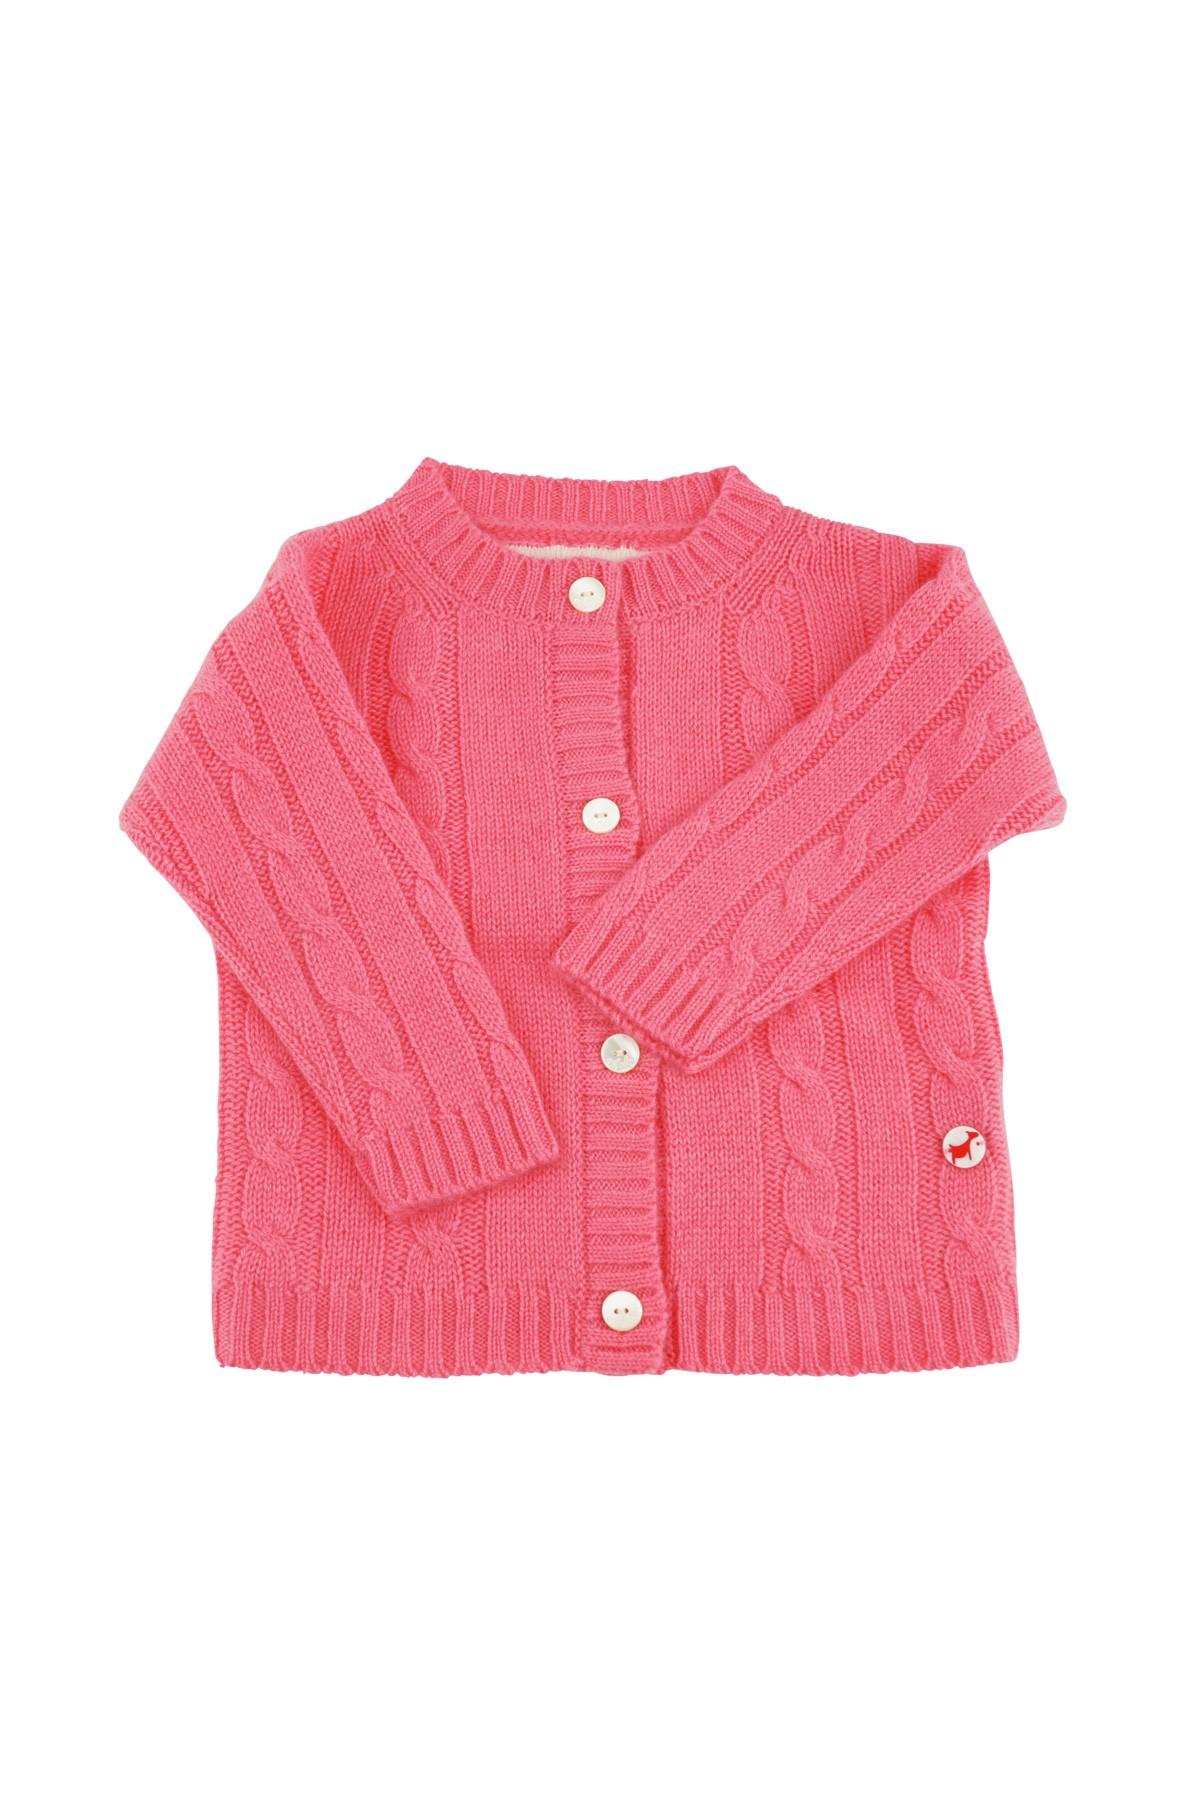 Baby Strickjacke Zopfmuster pink